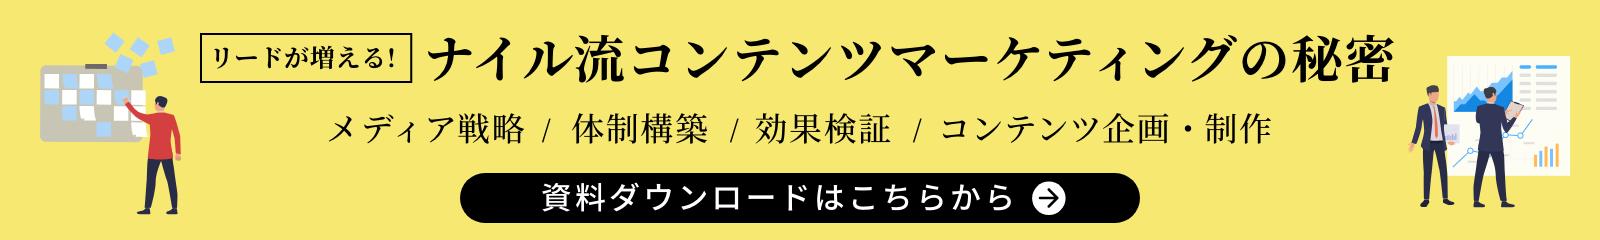 banner_yellow02